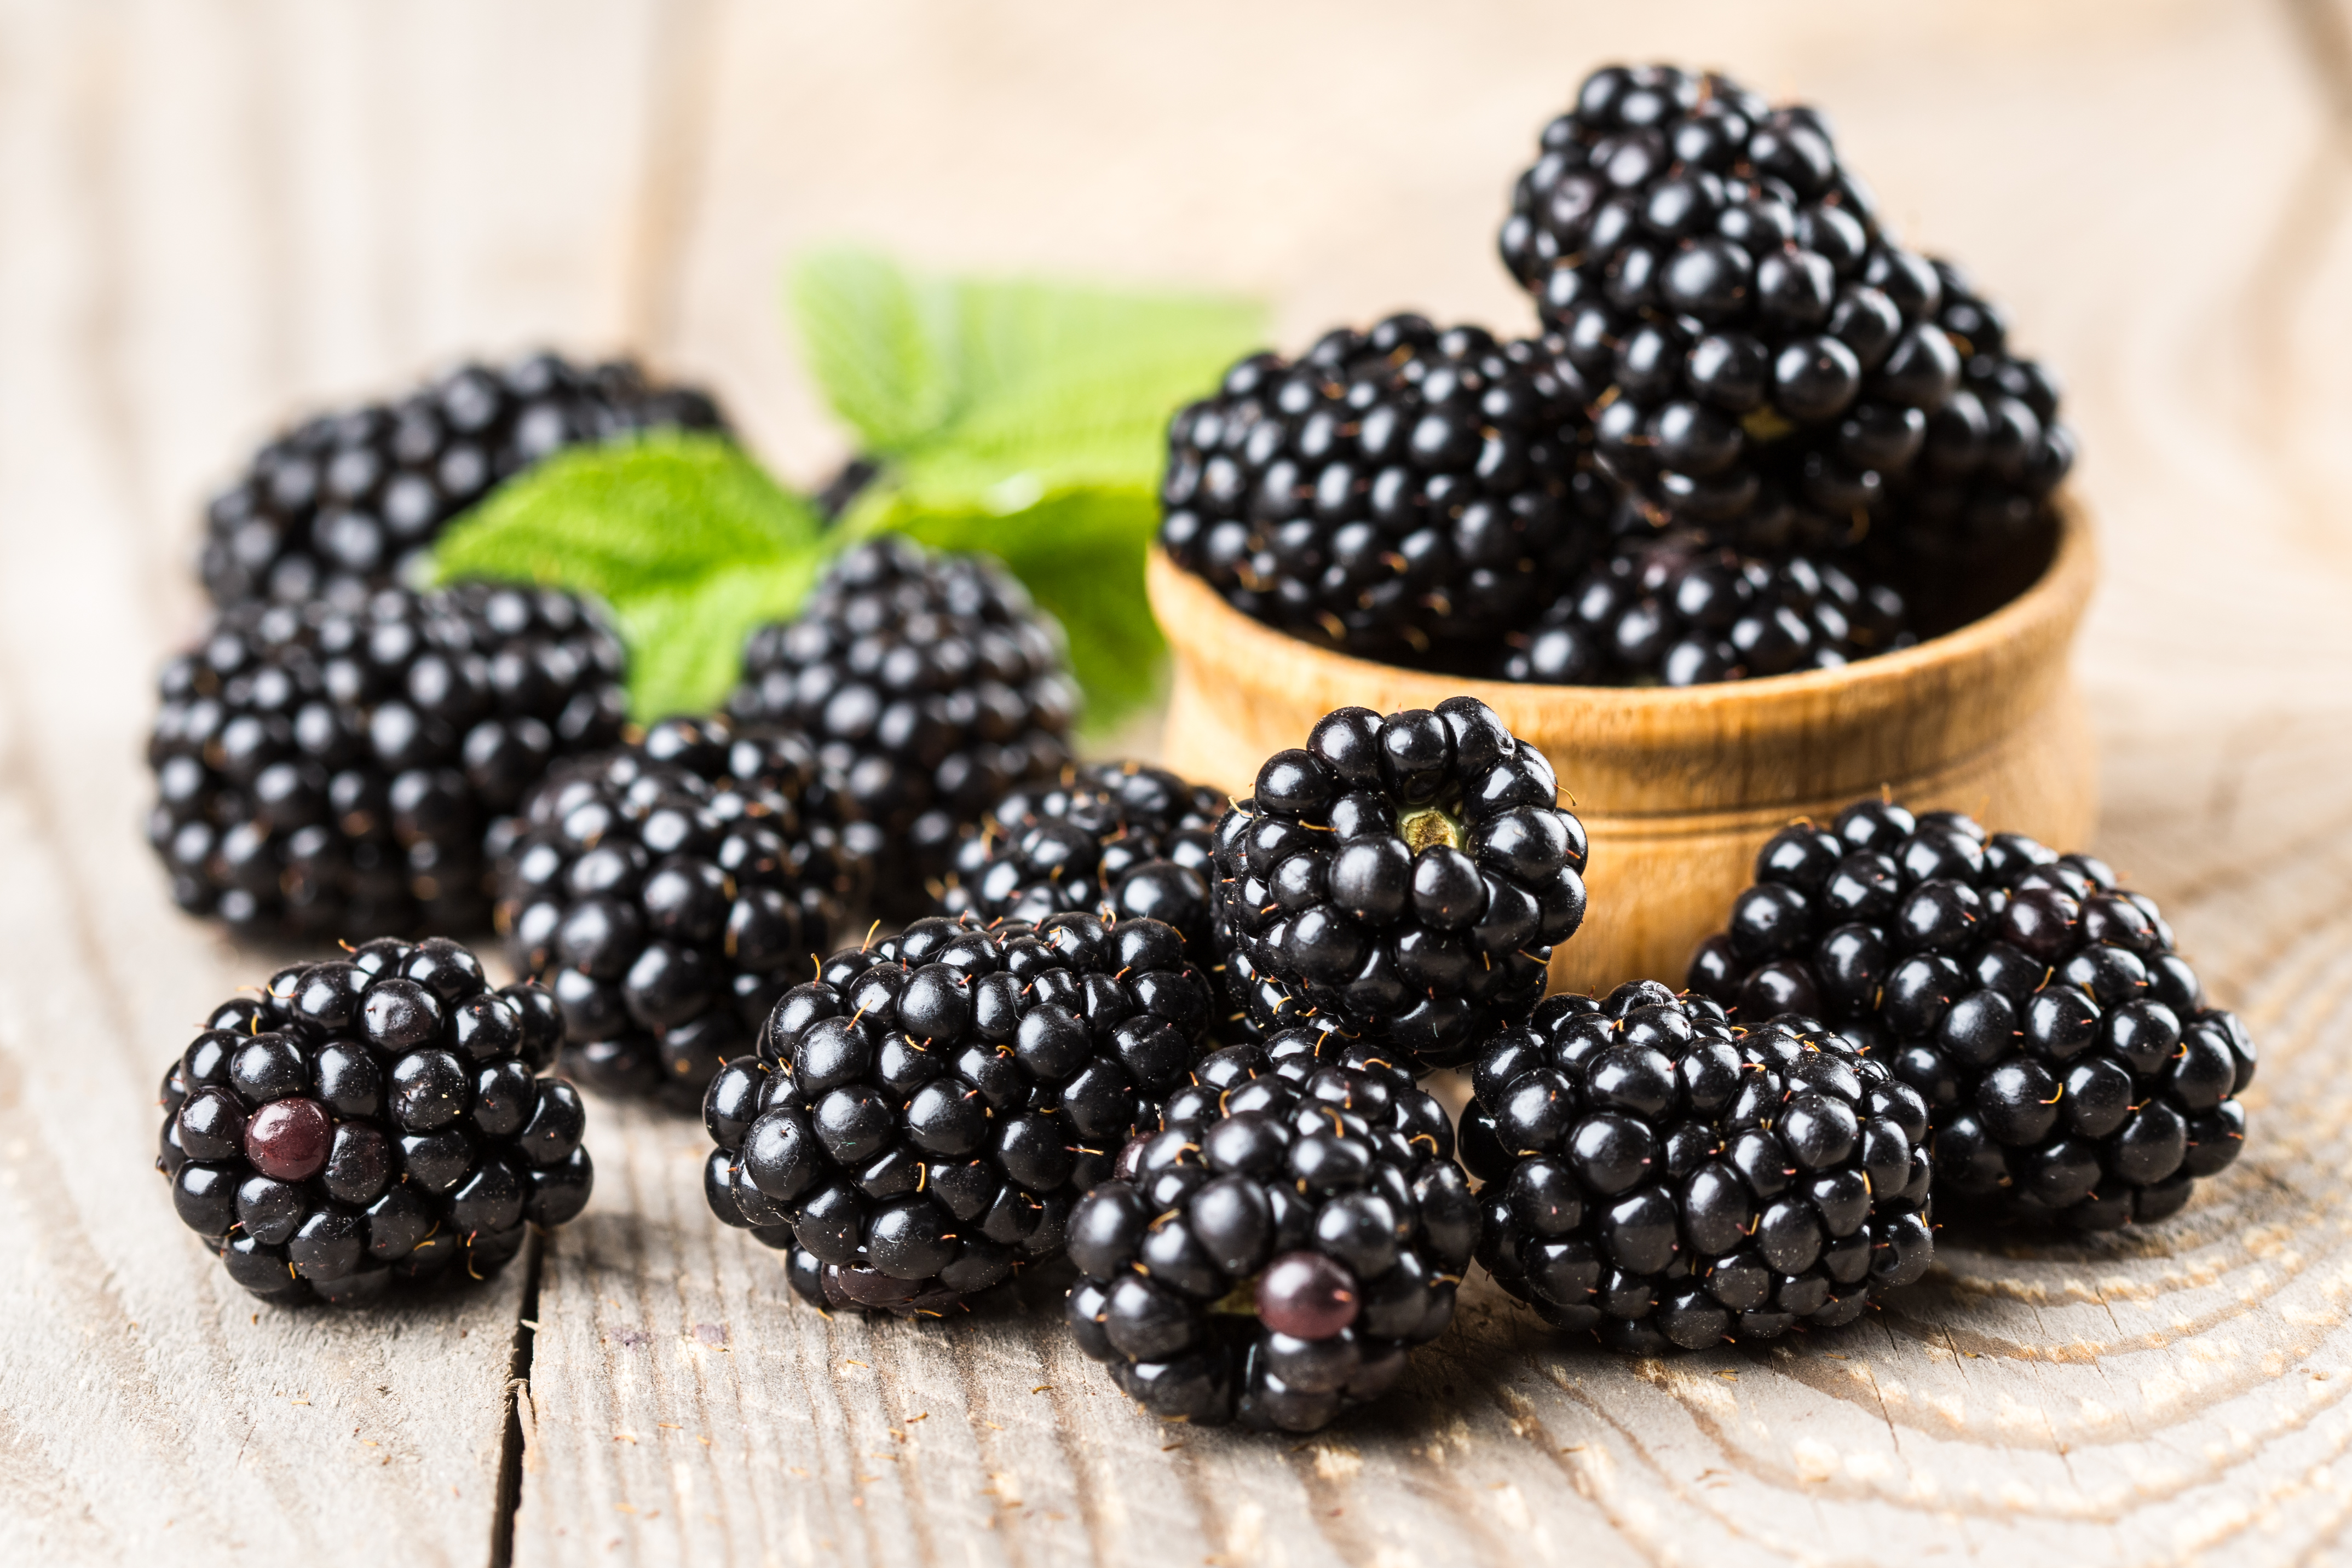 Blackberries & mint